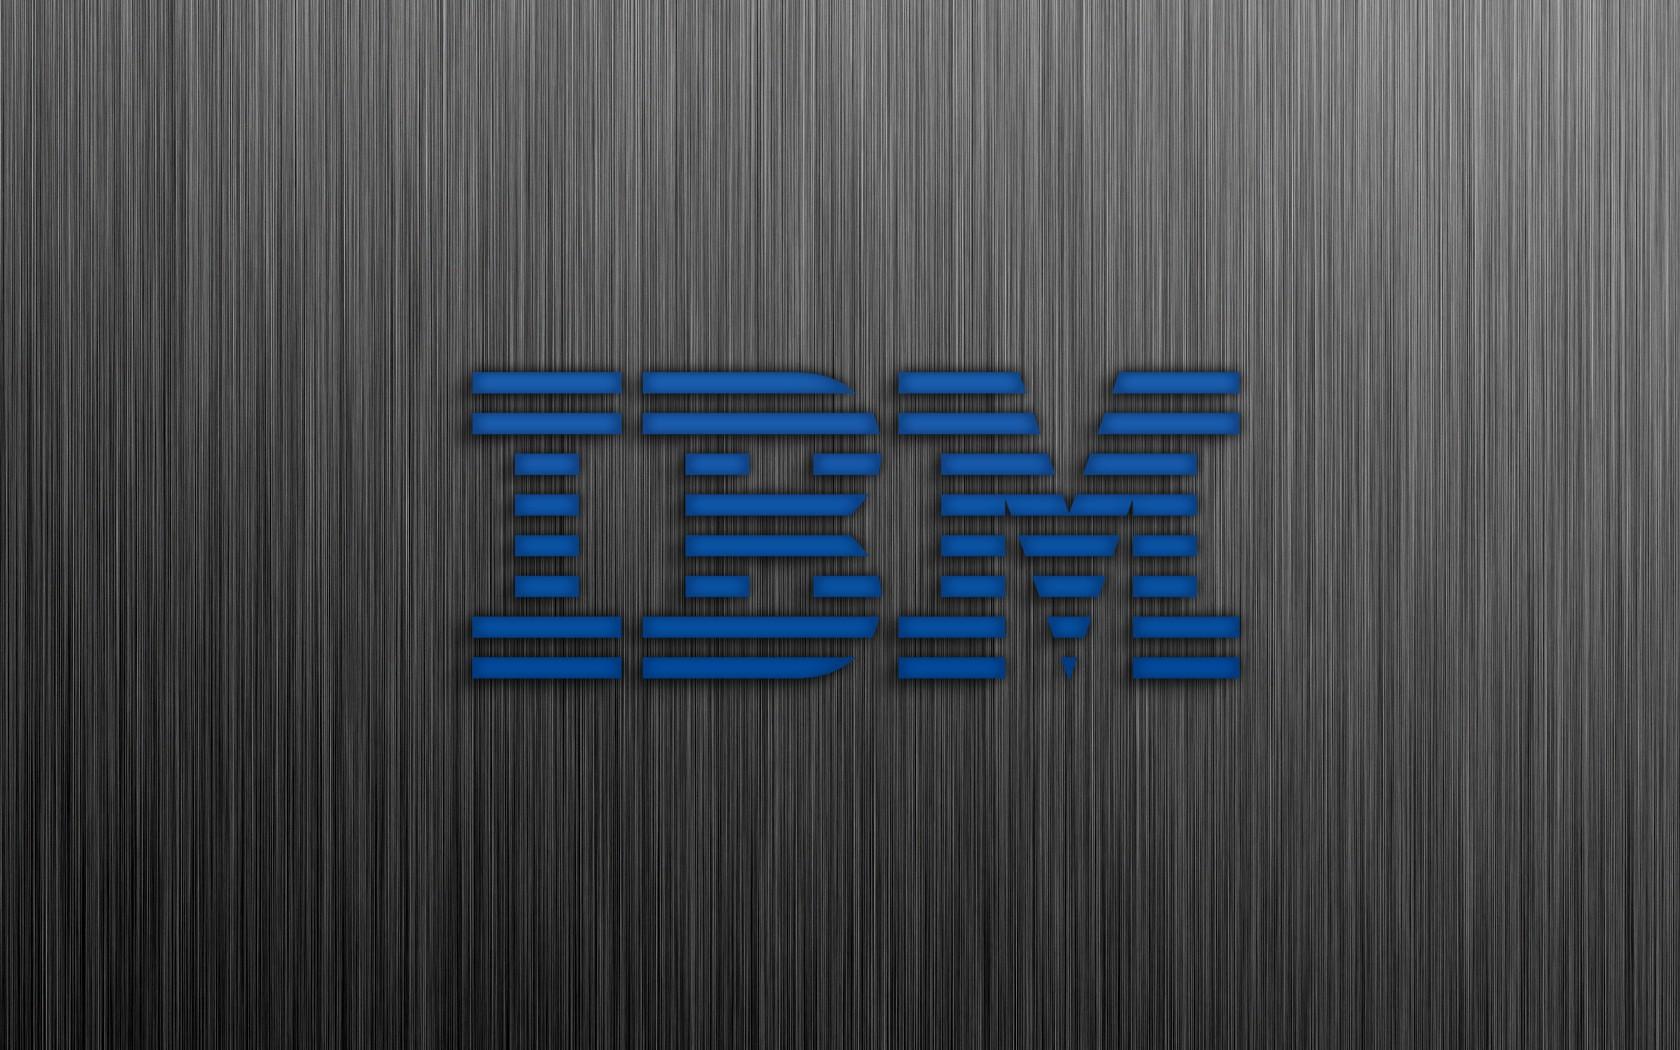 Ibm Brands Logos Hd Wallpaper Desktop